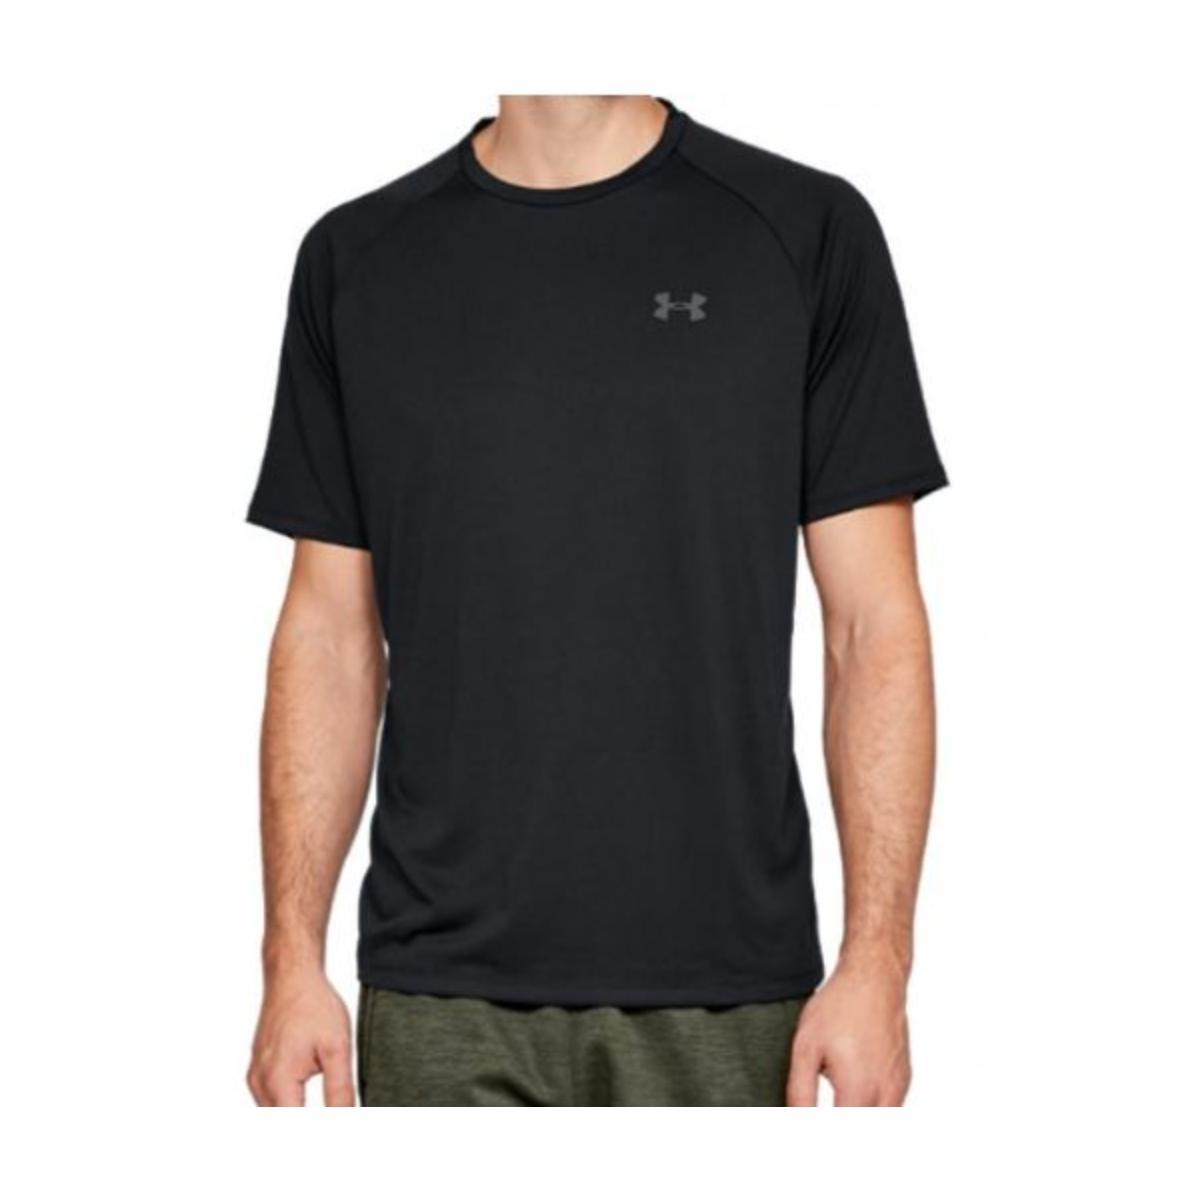 Camiseta Masculina Under Armour 1359378  Tech 2.0 Preto